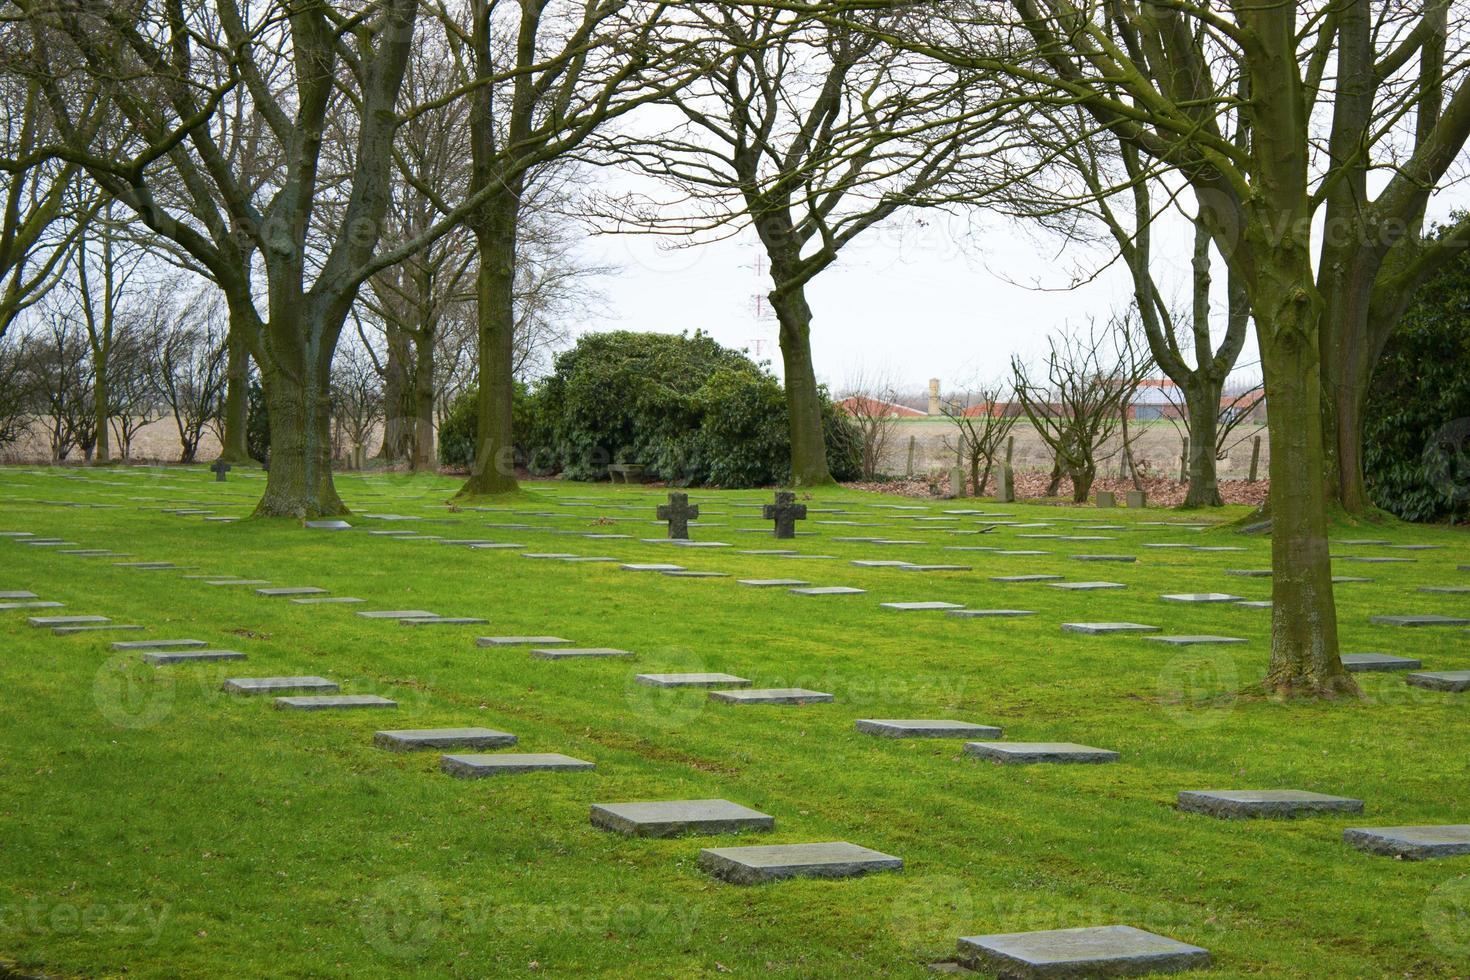 alemão grande guerra mundial 1 flanders fields belgium cemetery foto